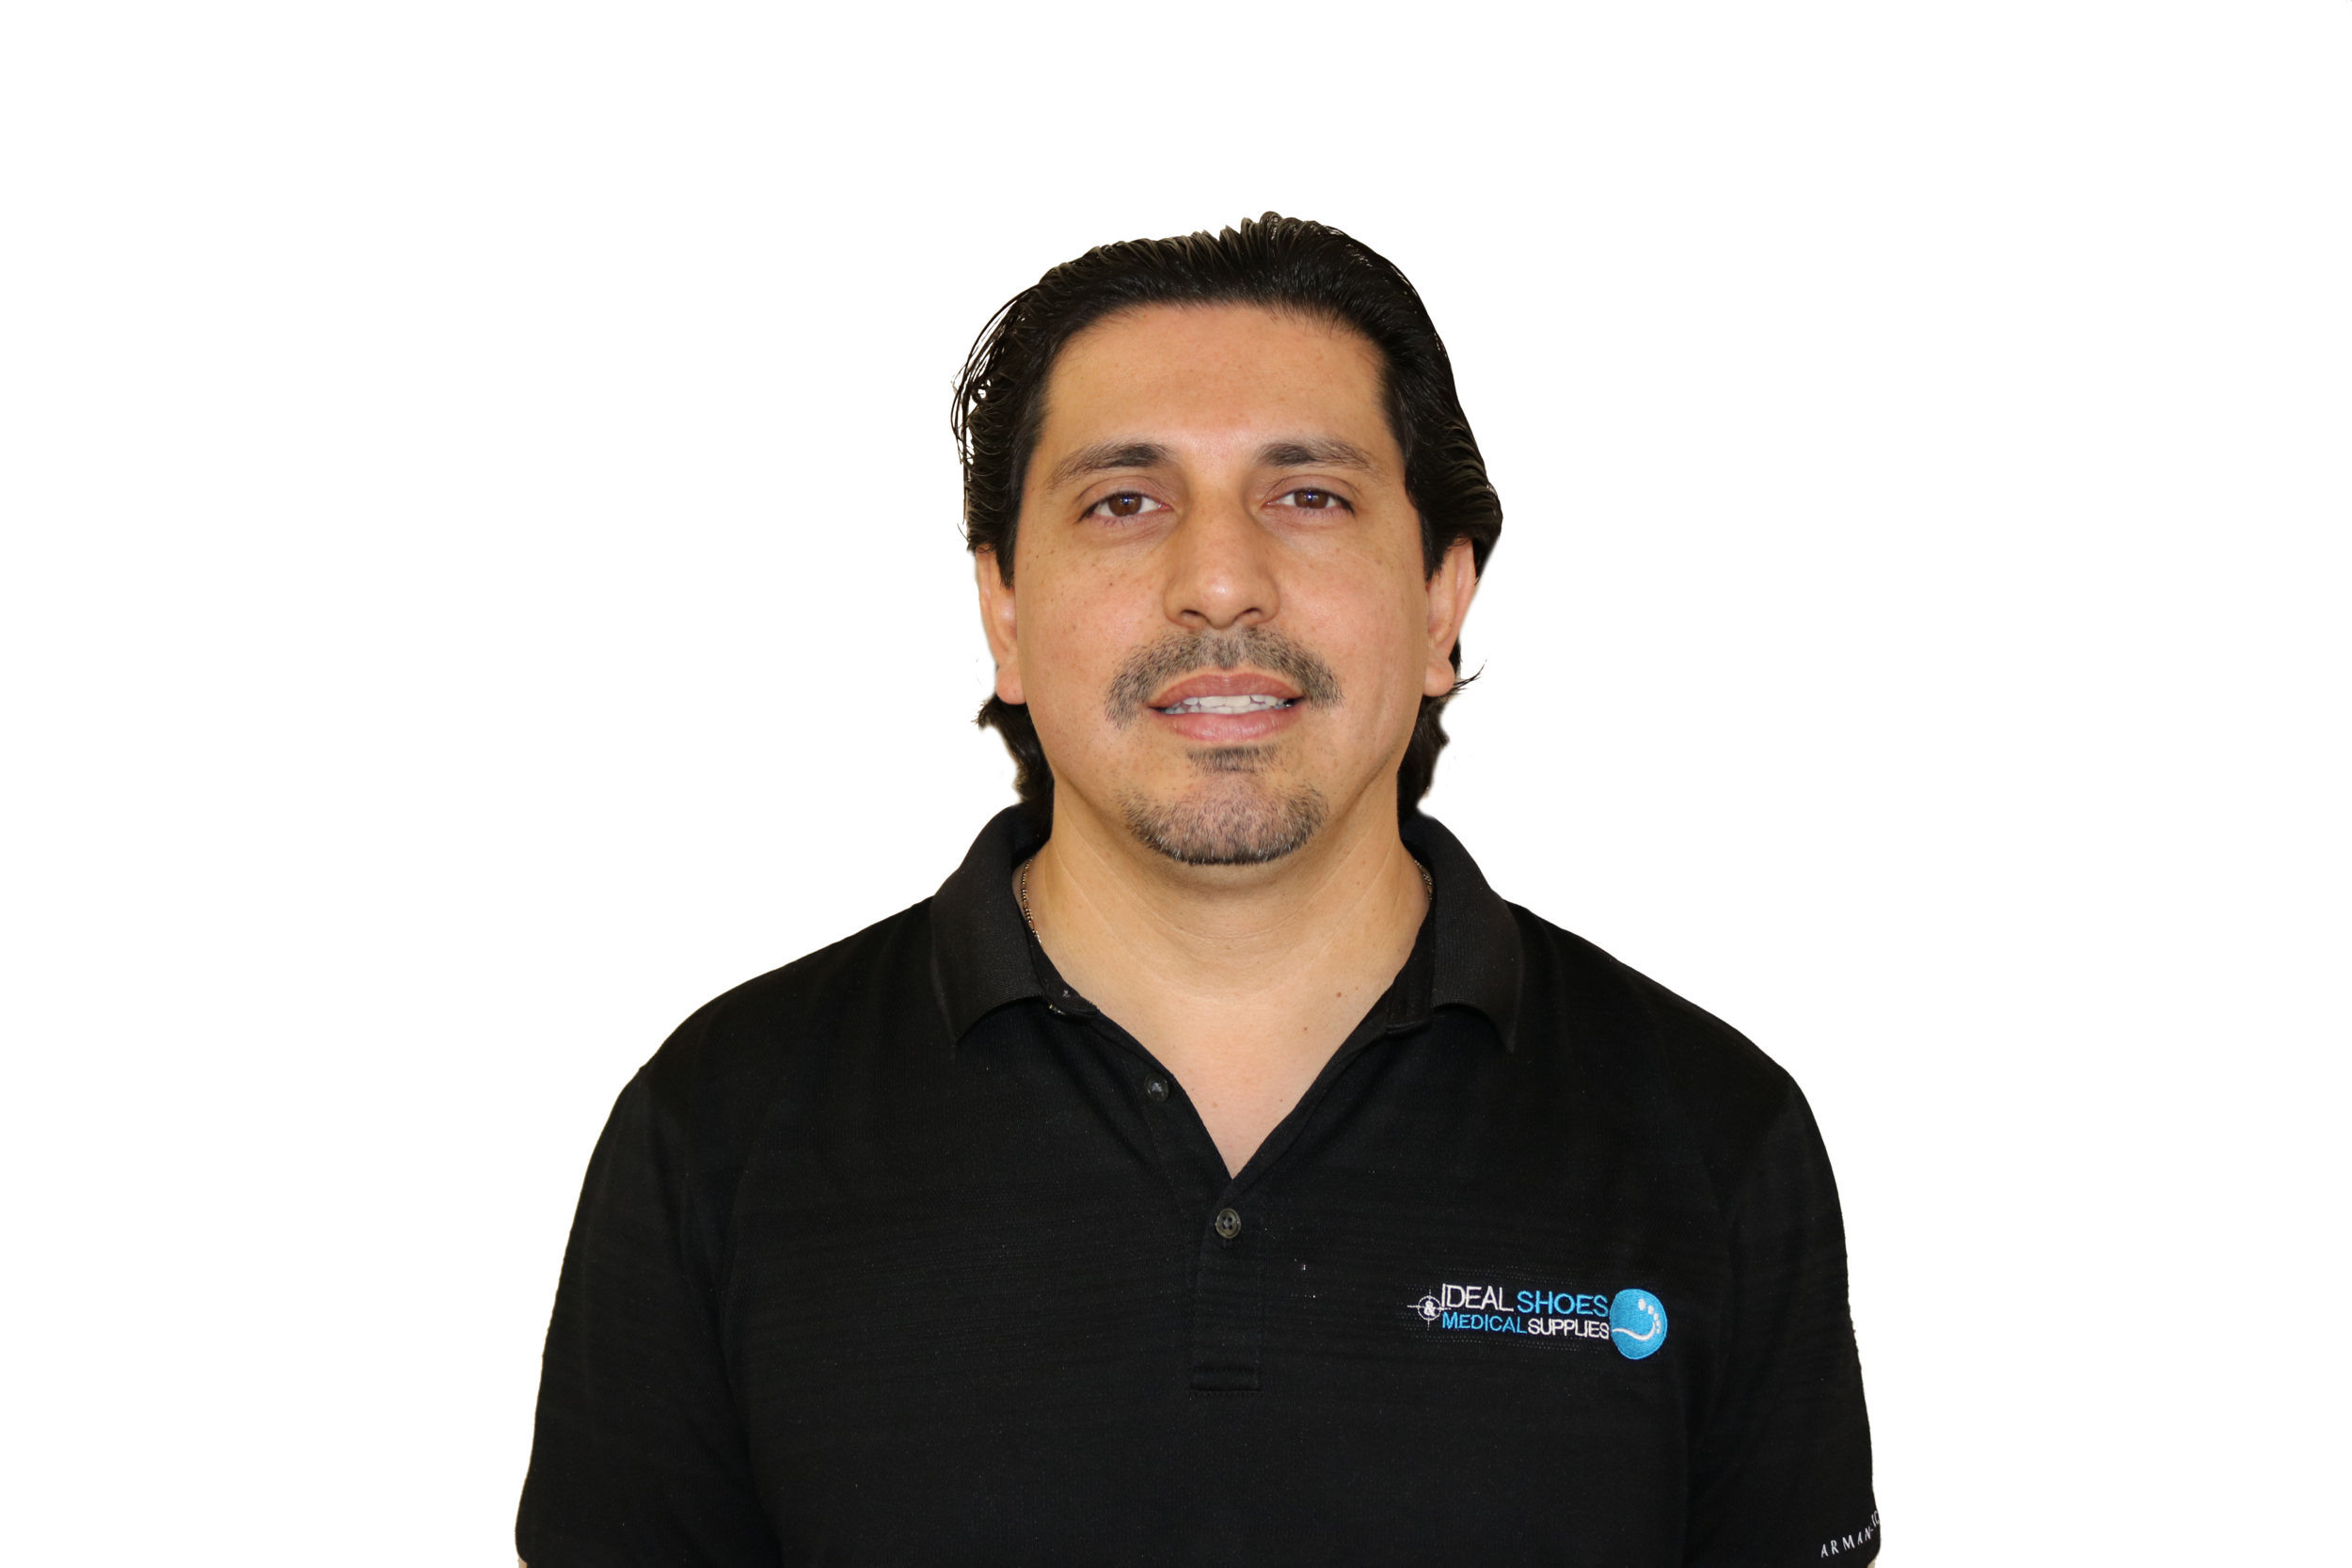 Daniel Salazar - Owner